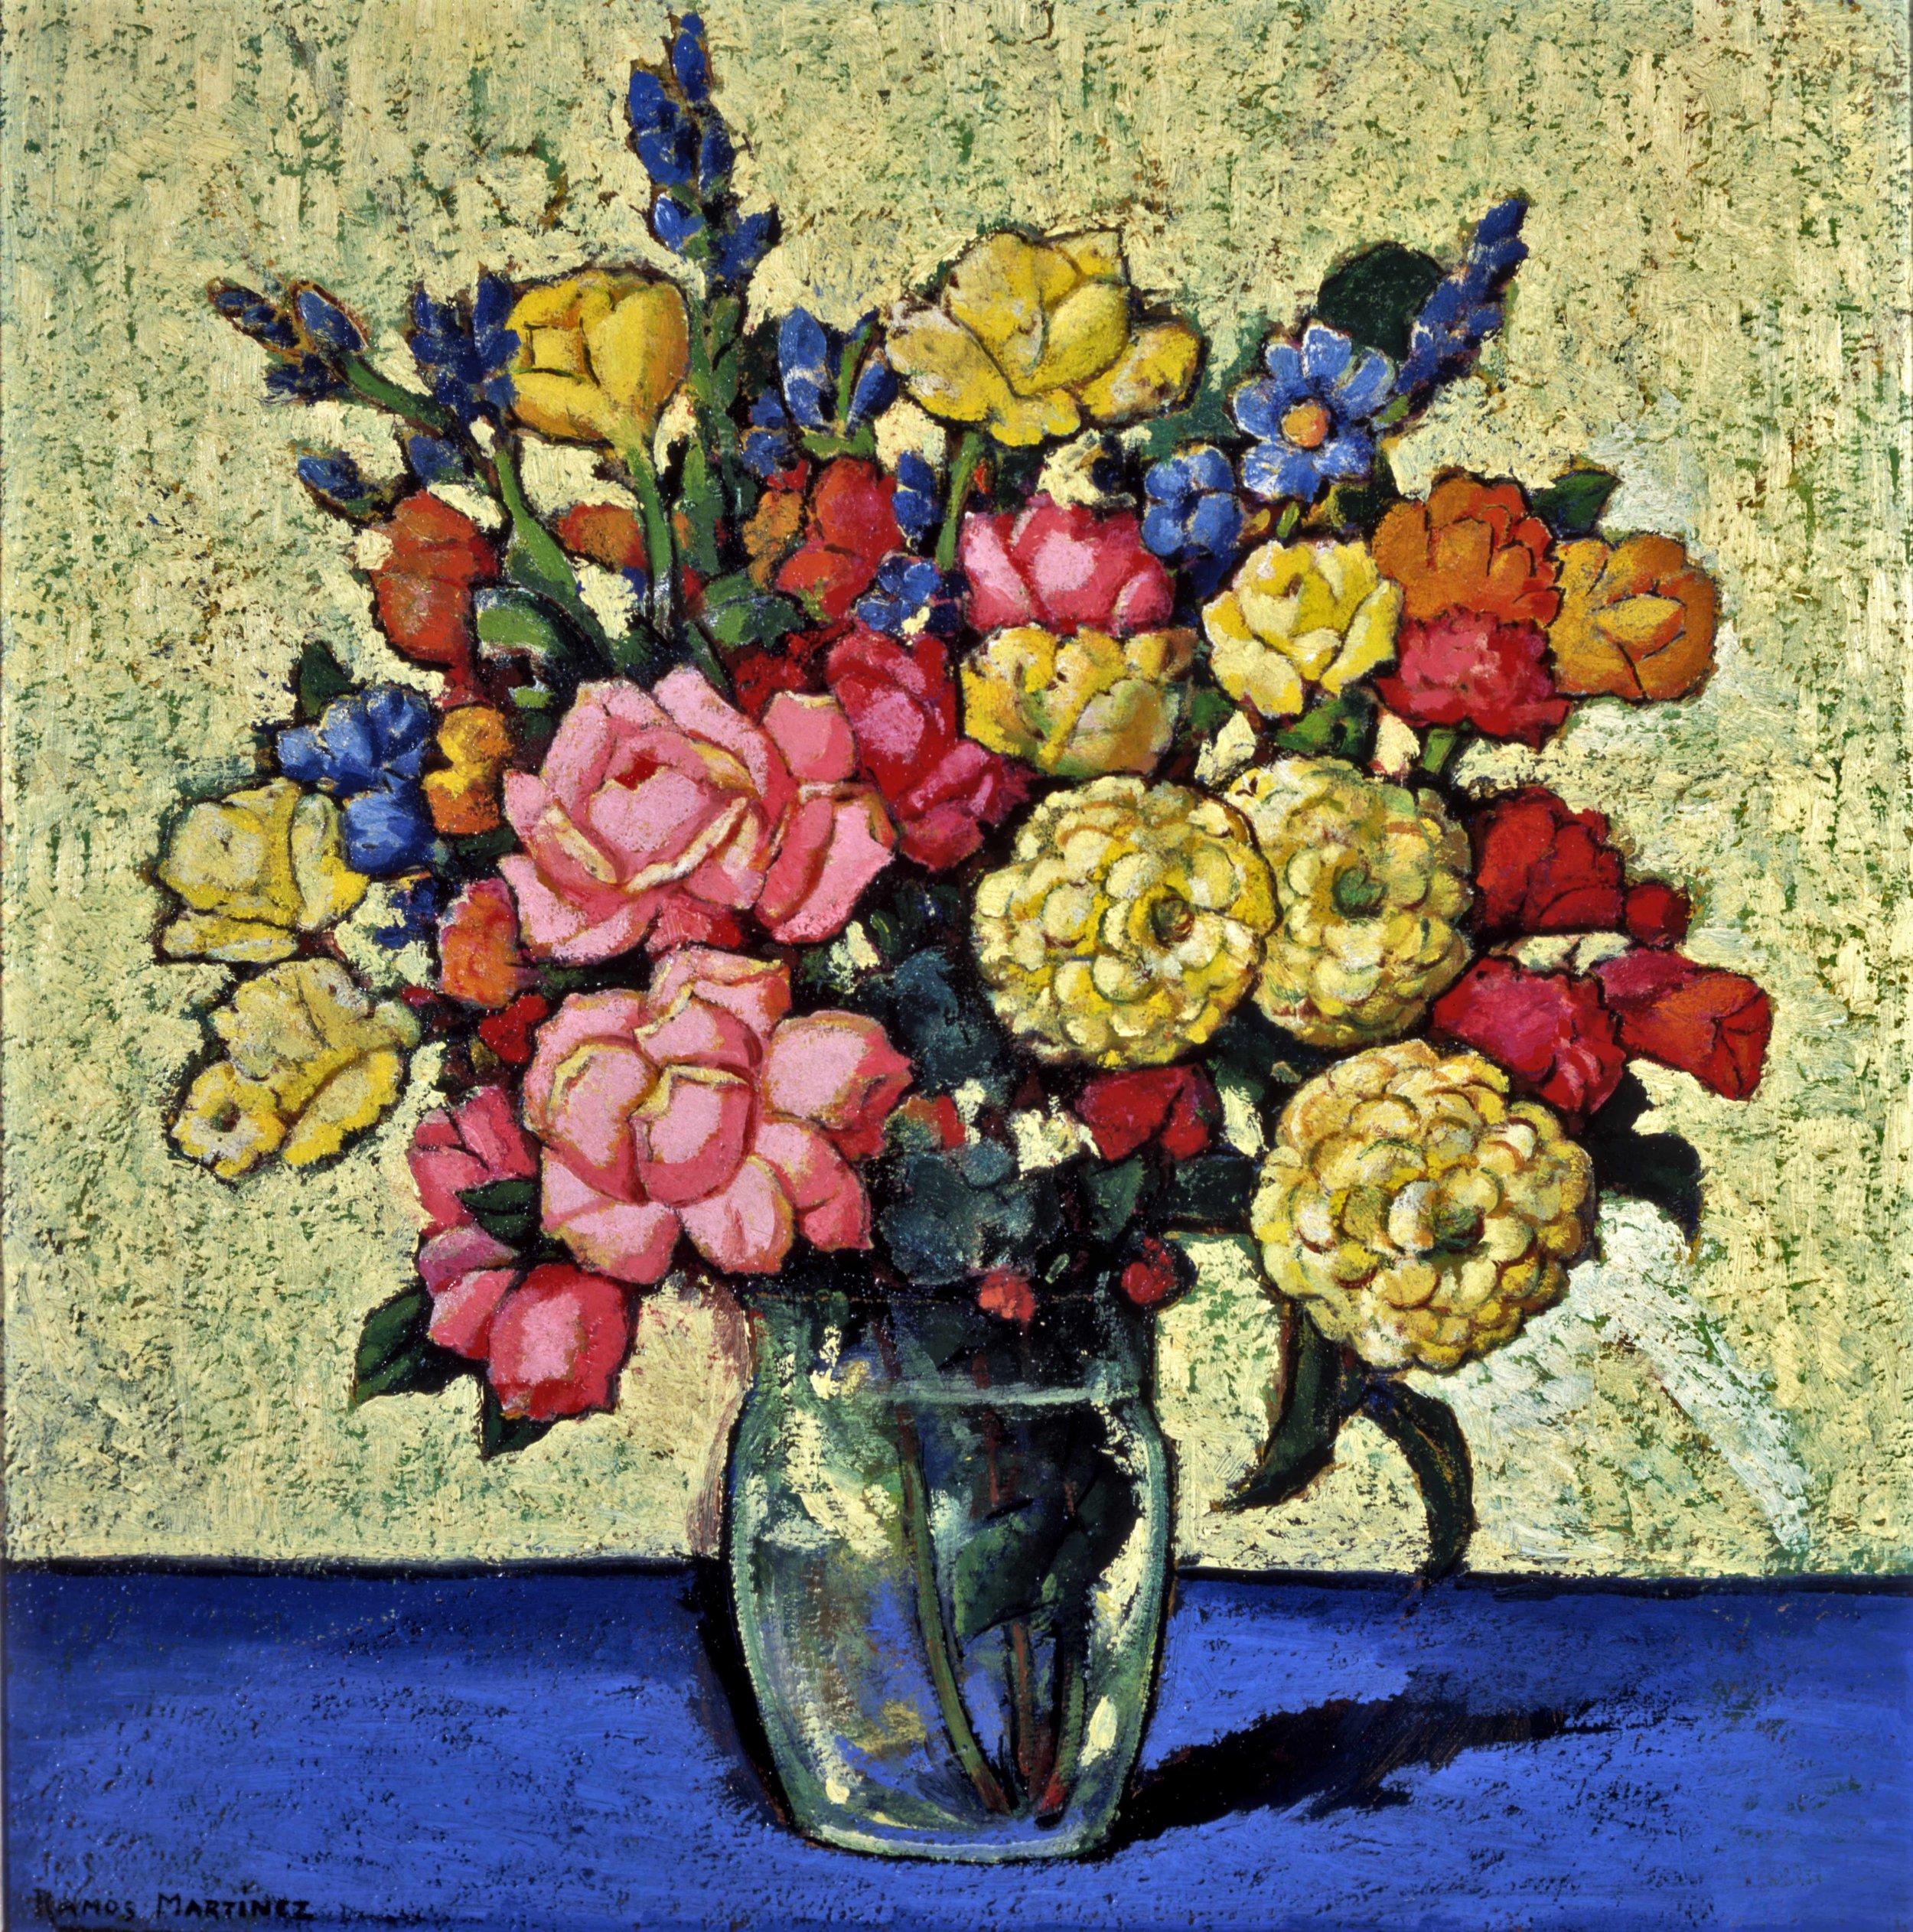 Jarrón con Flores / Vase with Flowers  ca. 1936 oil on masonite / óleo sobre masonite 25.56 x 25.56 inches; 64.92 x 64.92 centímetros Private collection